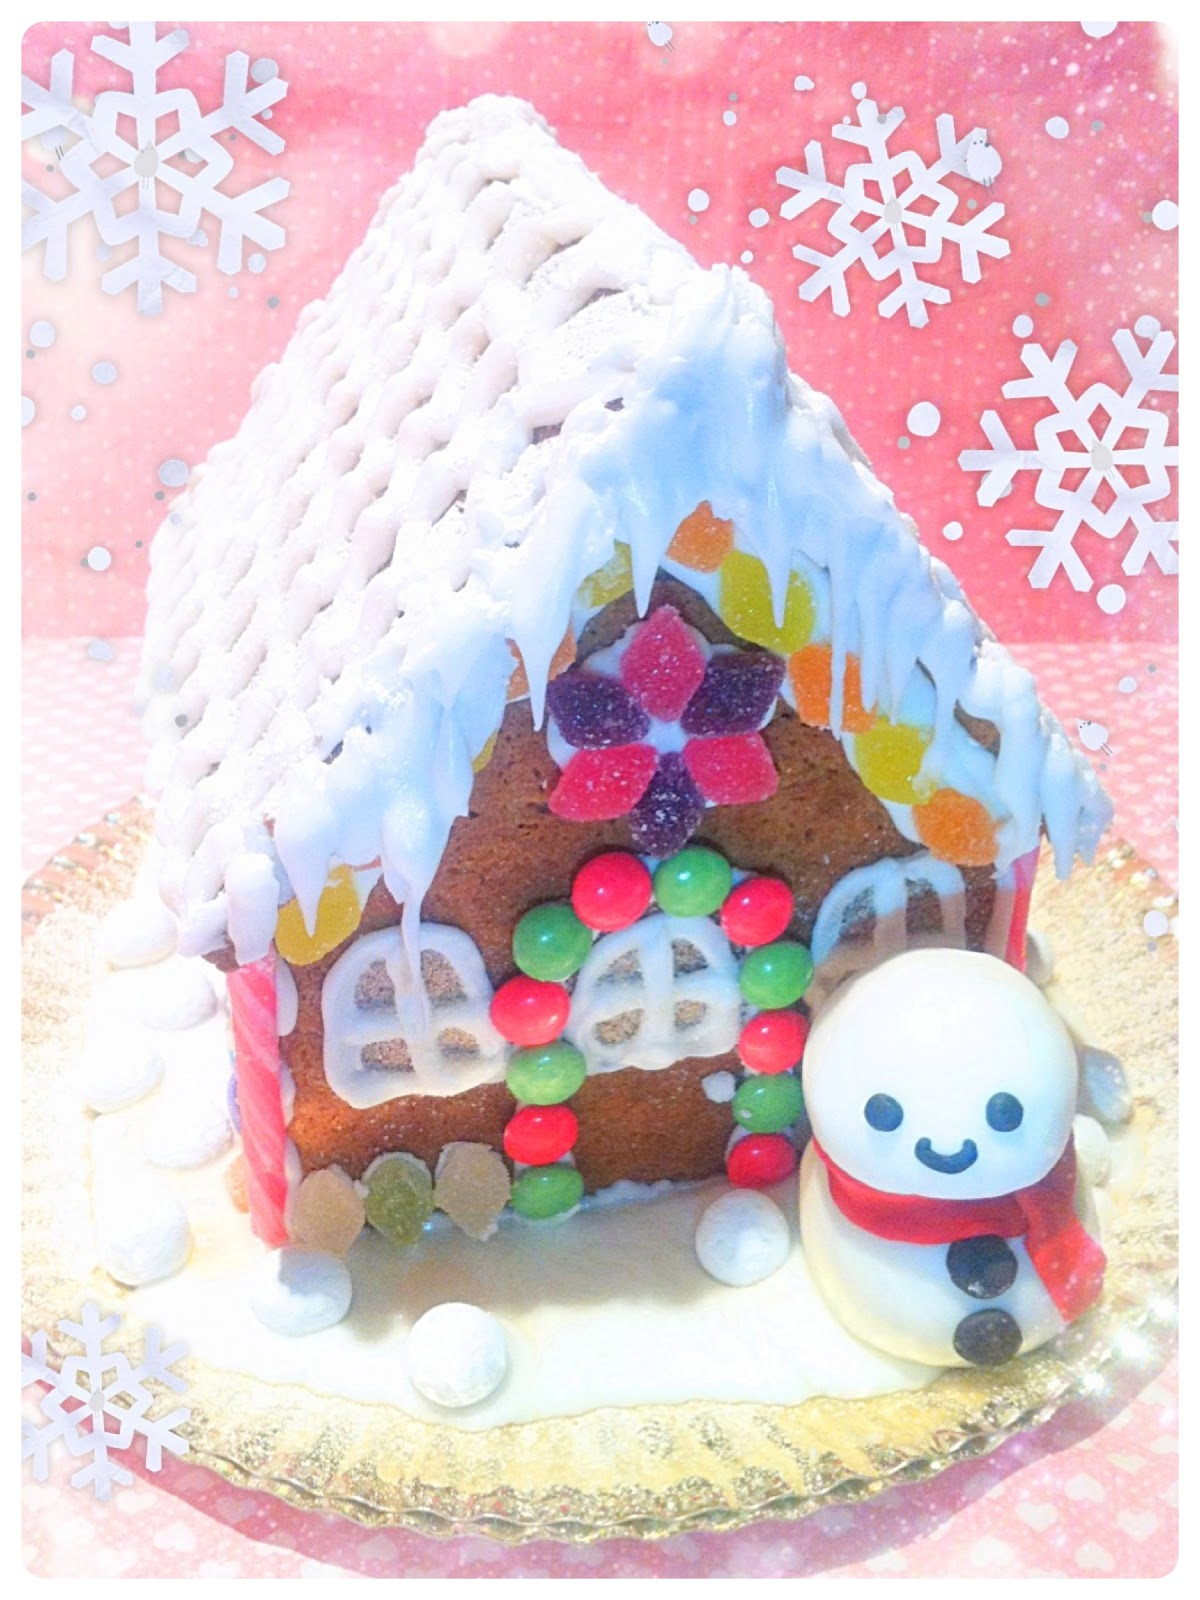 Gingerbread House Cherie Kelly Cake London